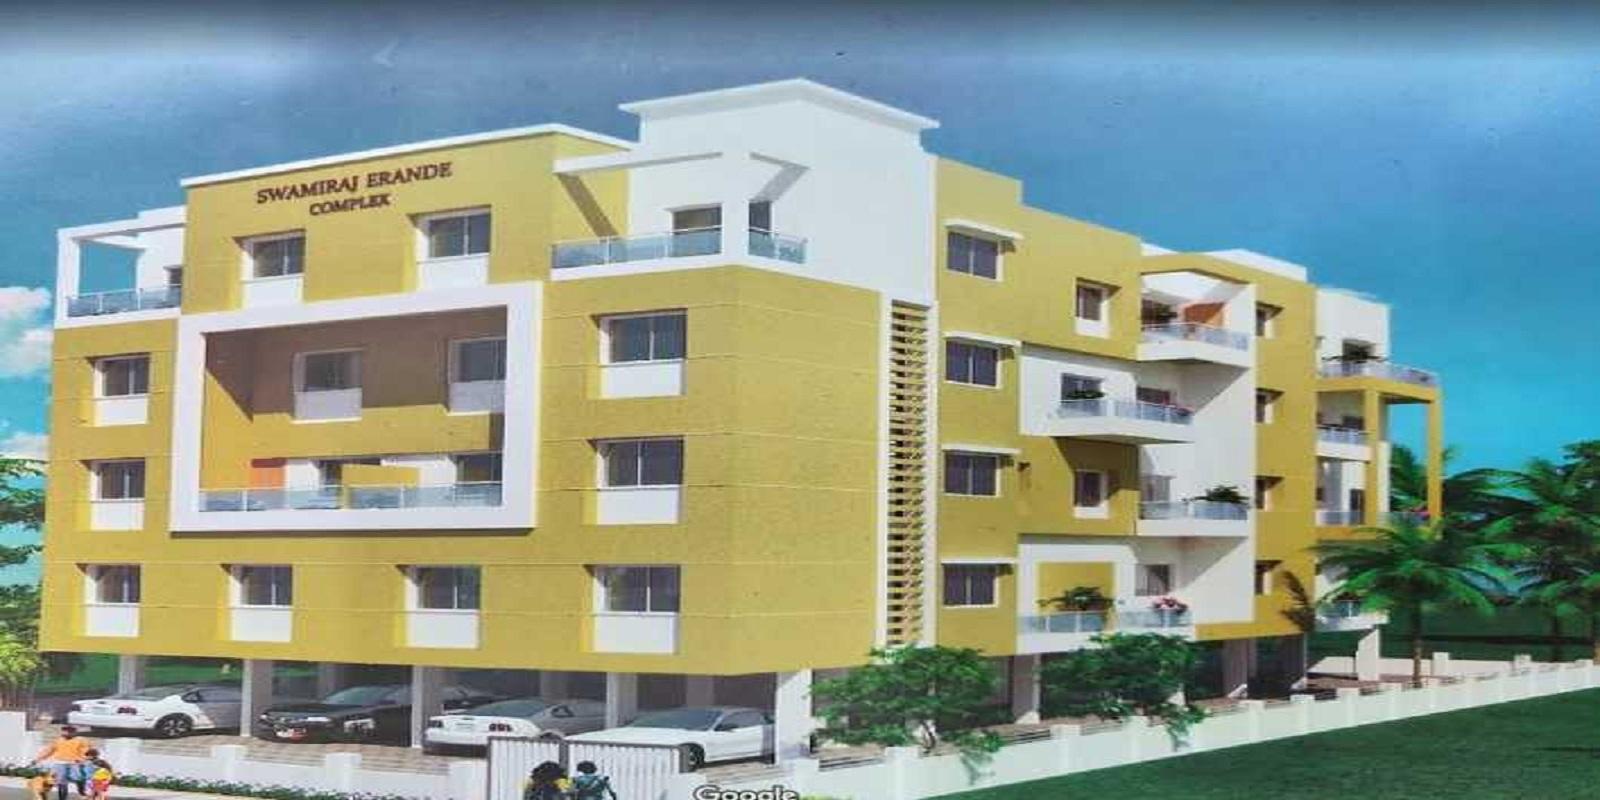 swamiraj erande complex project project large image1